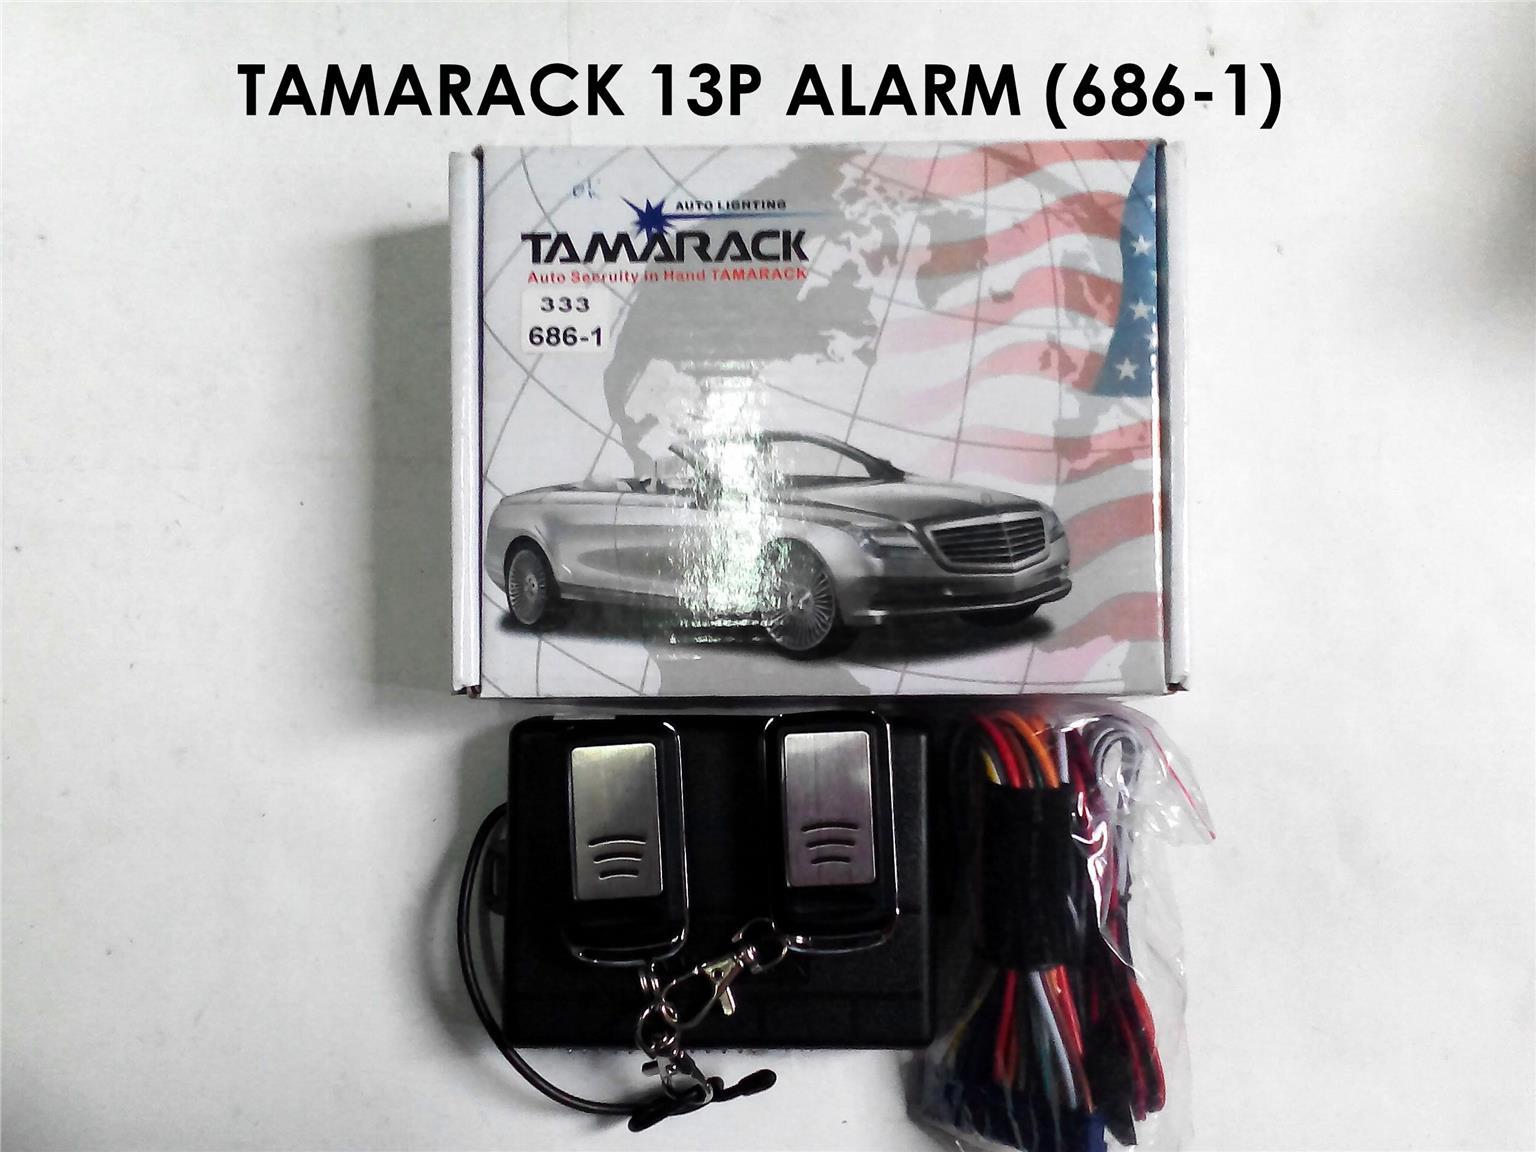 hight resolution of tamarack car alarm wiring diagram wiring diagram posts automate car alarm wiring diagram tamarack car alarm wiring diagram